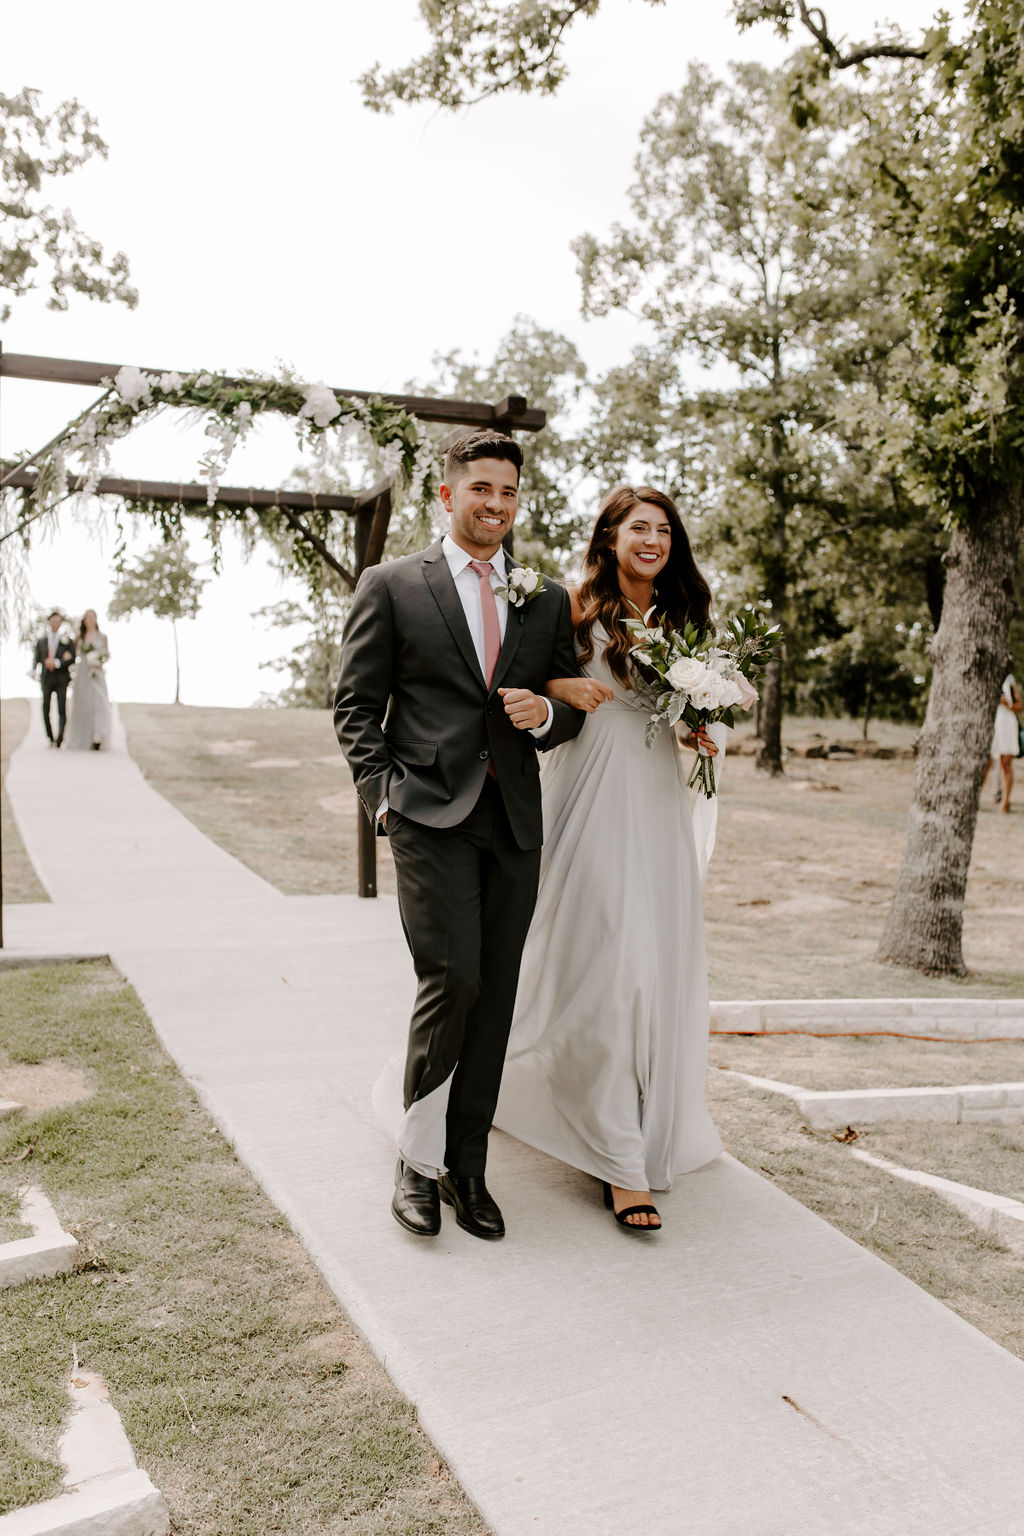 Tulsa White Barn Wedding Venue Outdoor Ceremony 67.jpg